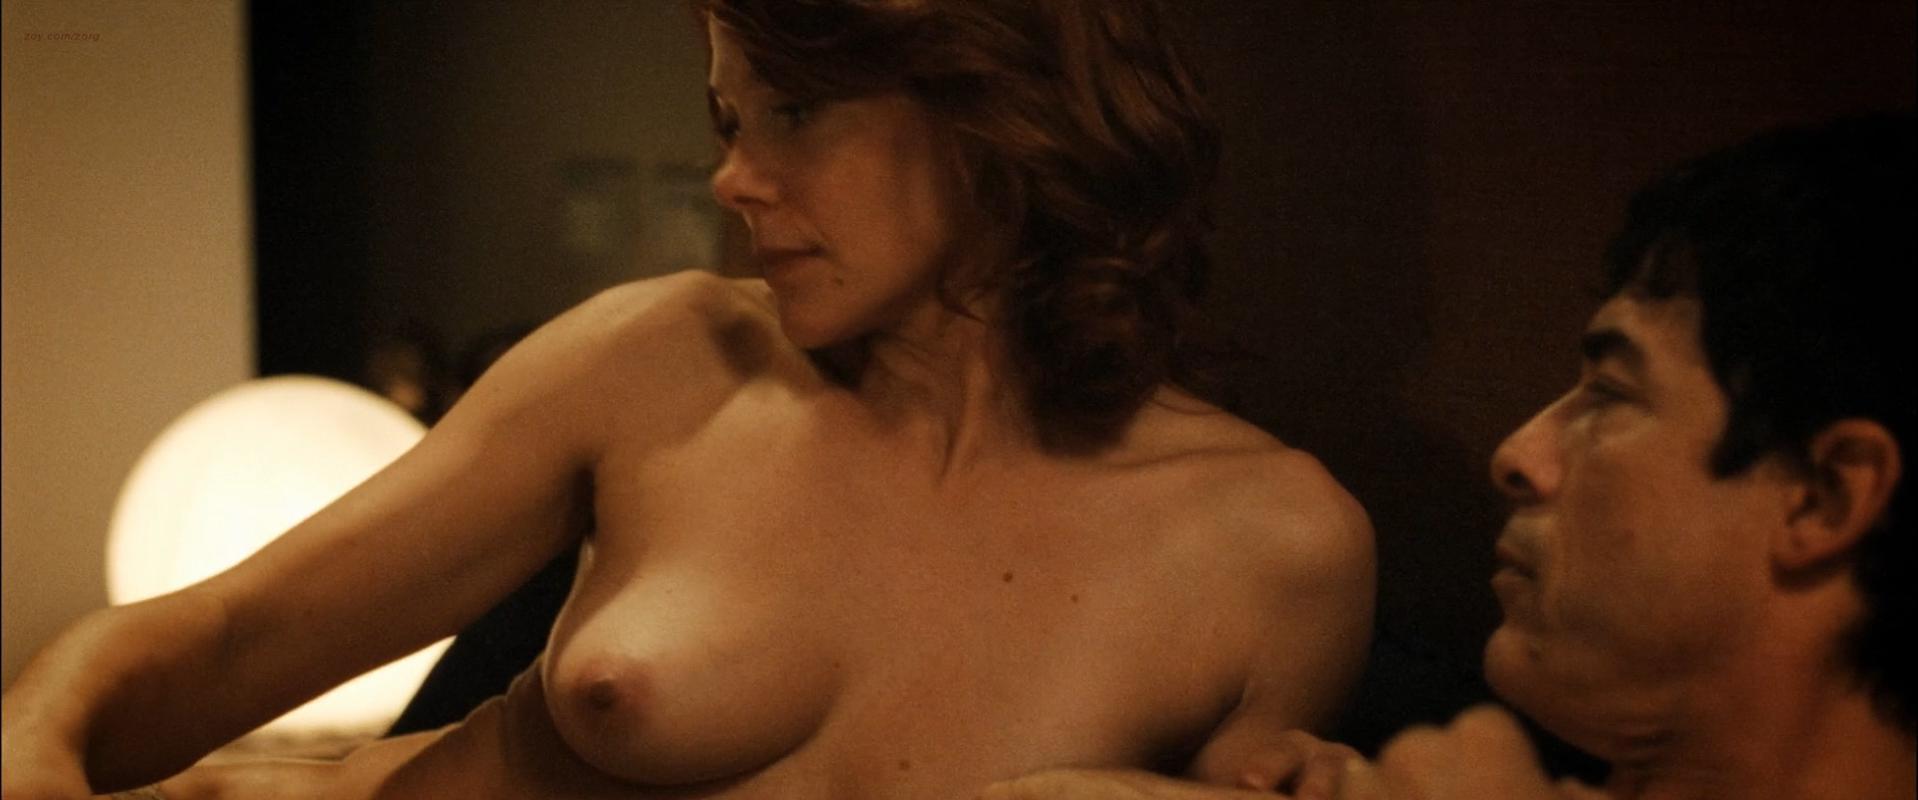 Barbora Bobulova nude - I nostri ragazzi (2014)